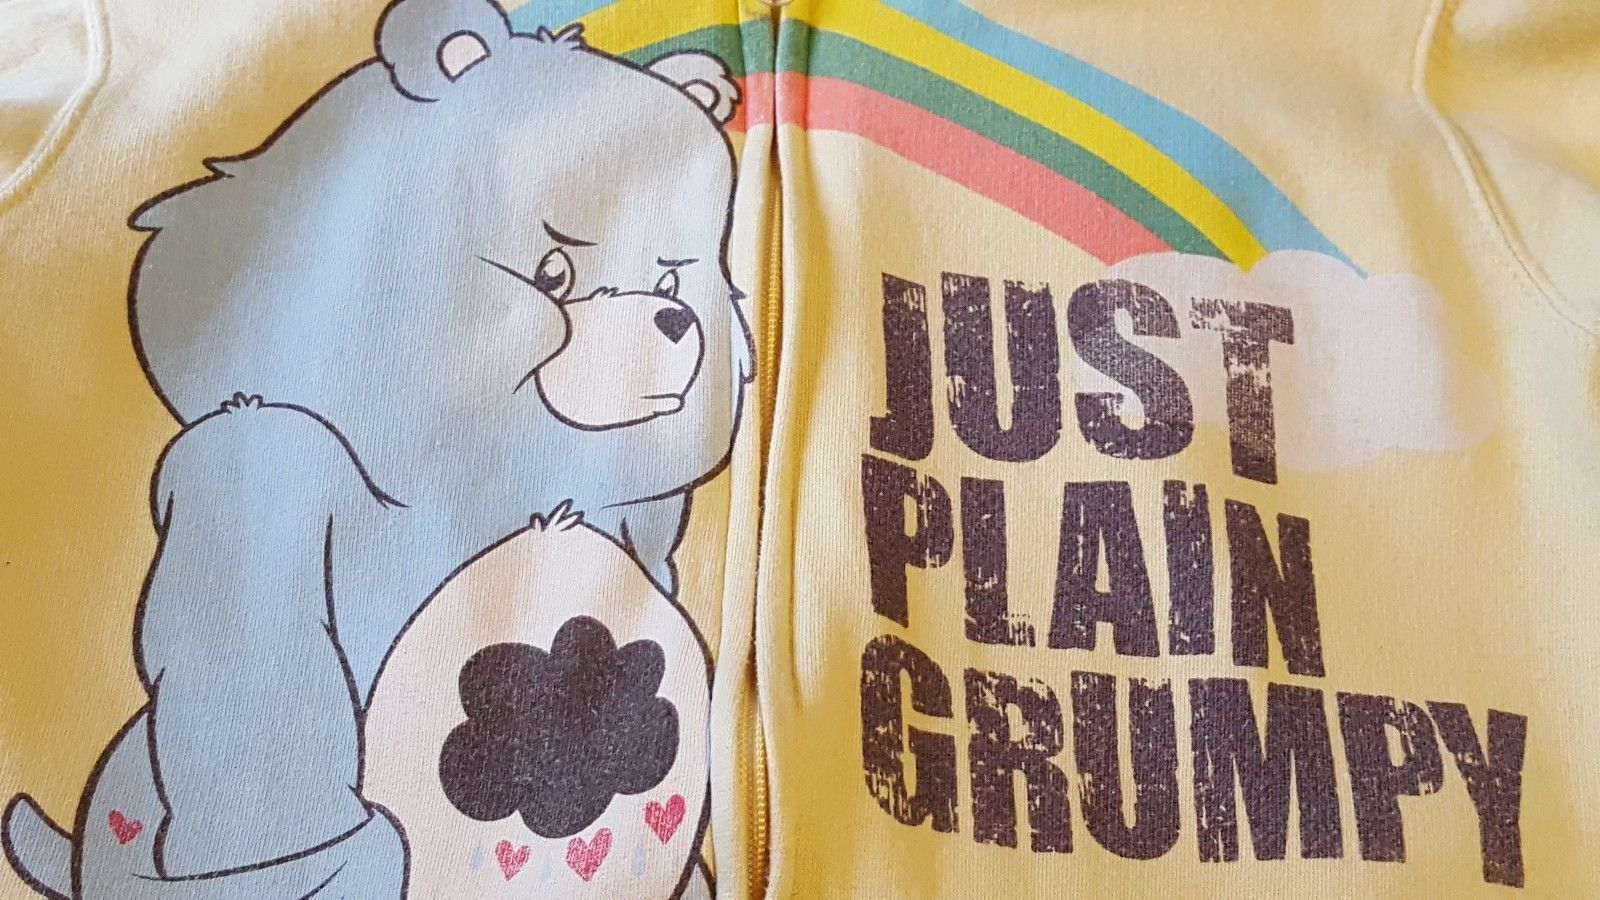 CARE BEARS RN 71868 - VINTAGE 2007 ~JUST PLAIN GRUMPY~ Women's Hoodie - Size: S